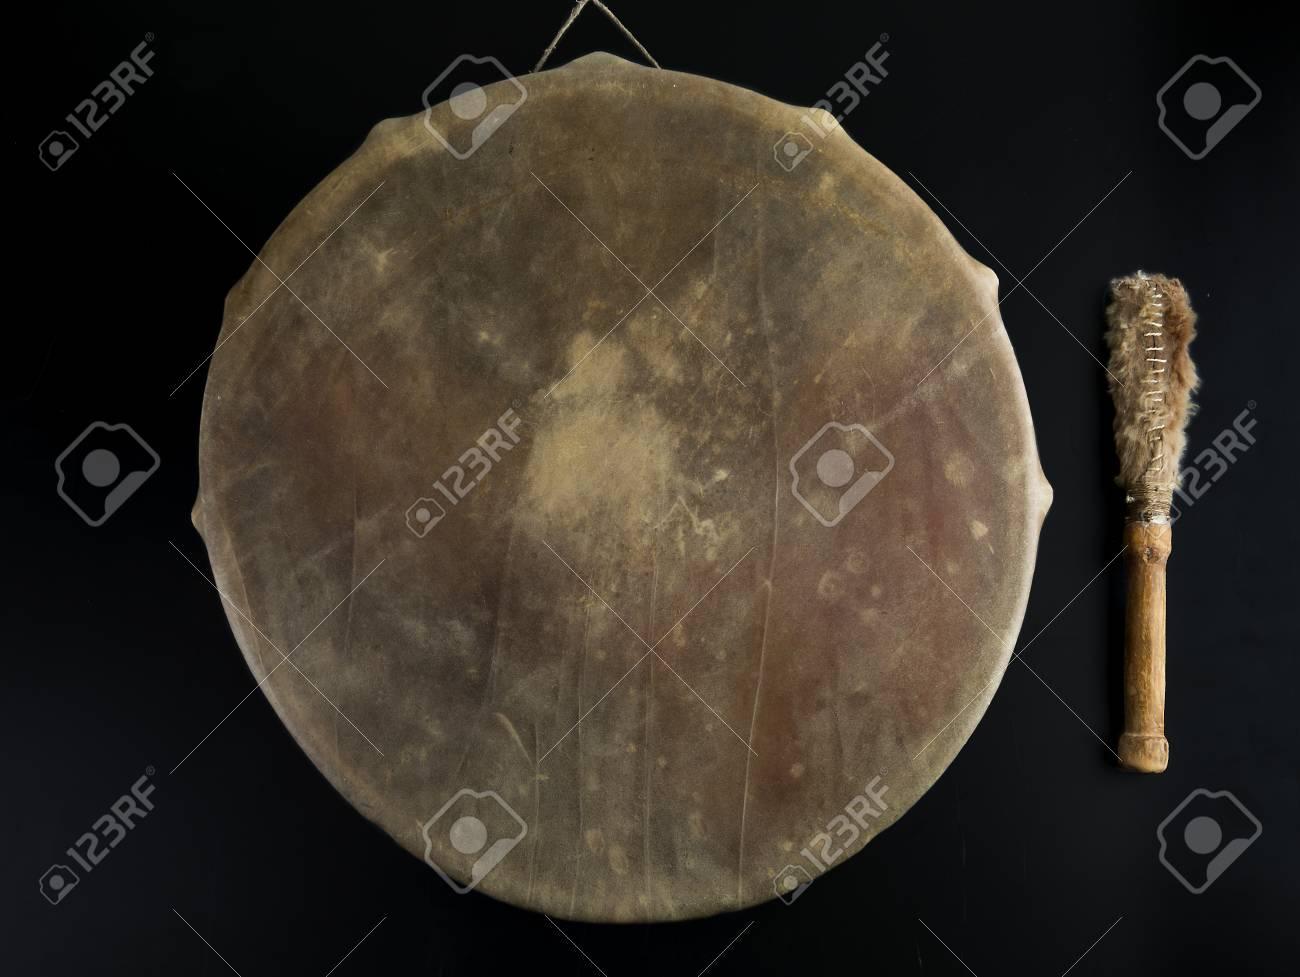 Ancient indian tambourine drum drumstick replica Stock Photo - 93857799